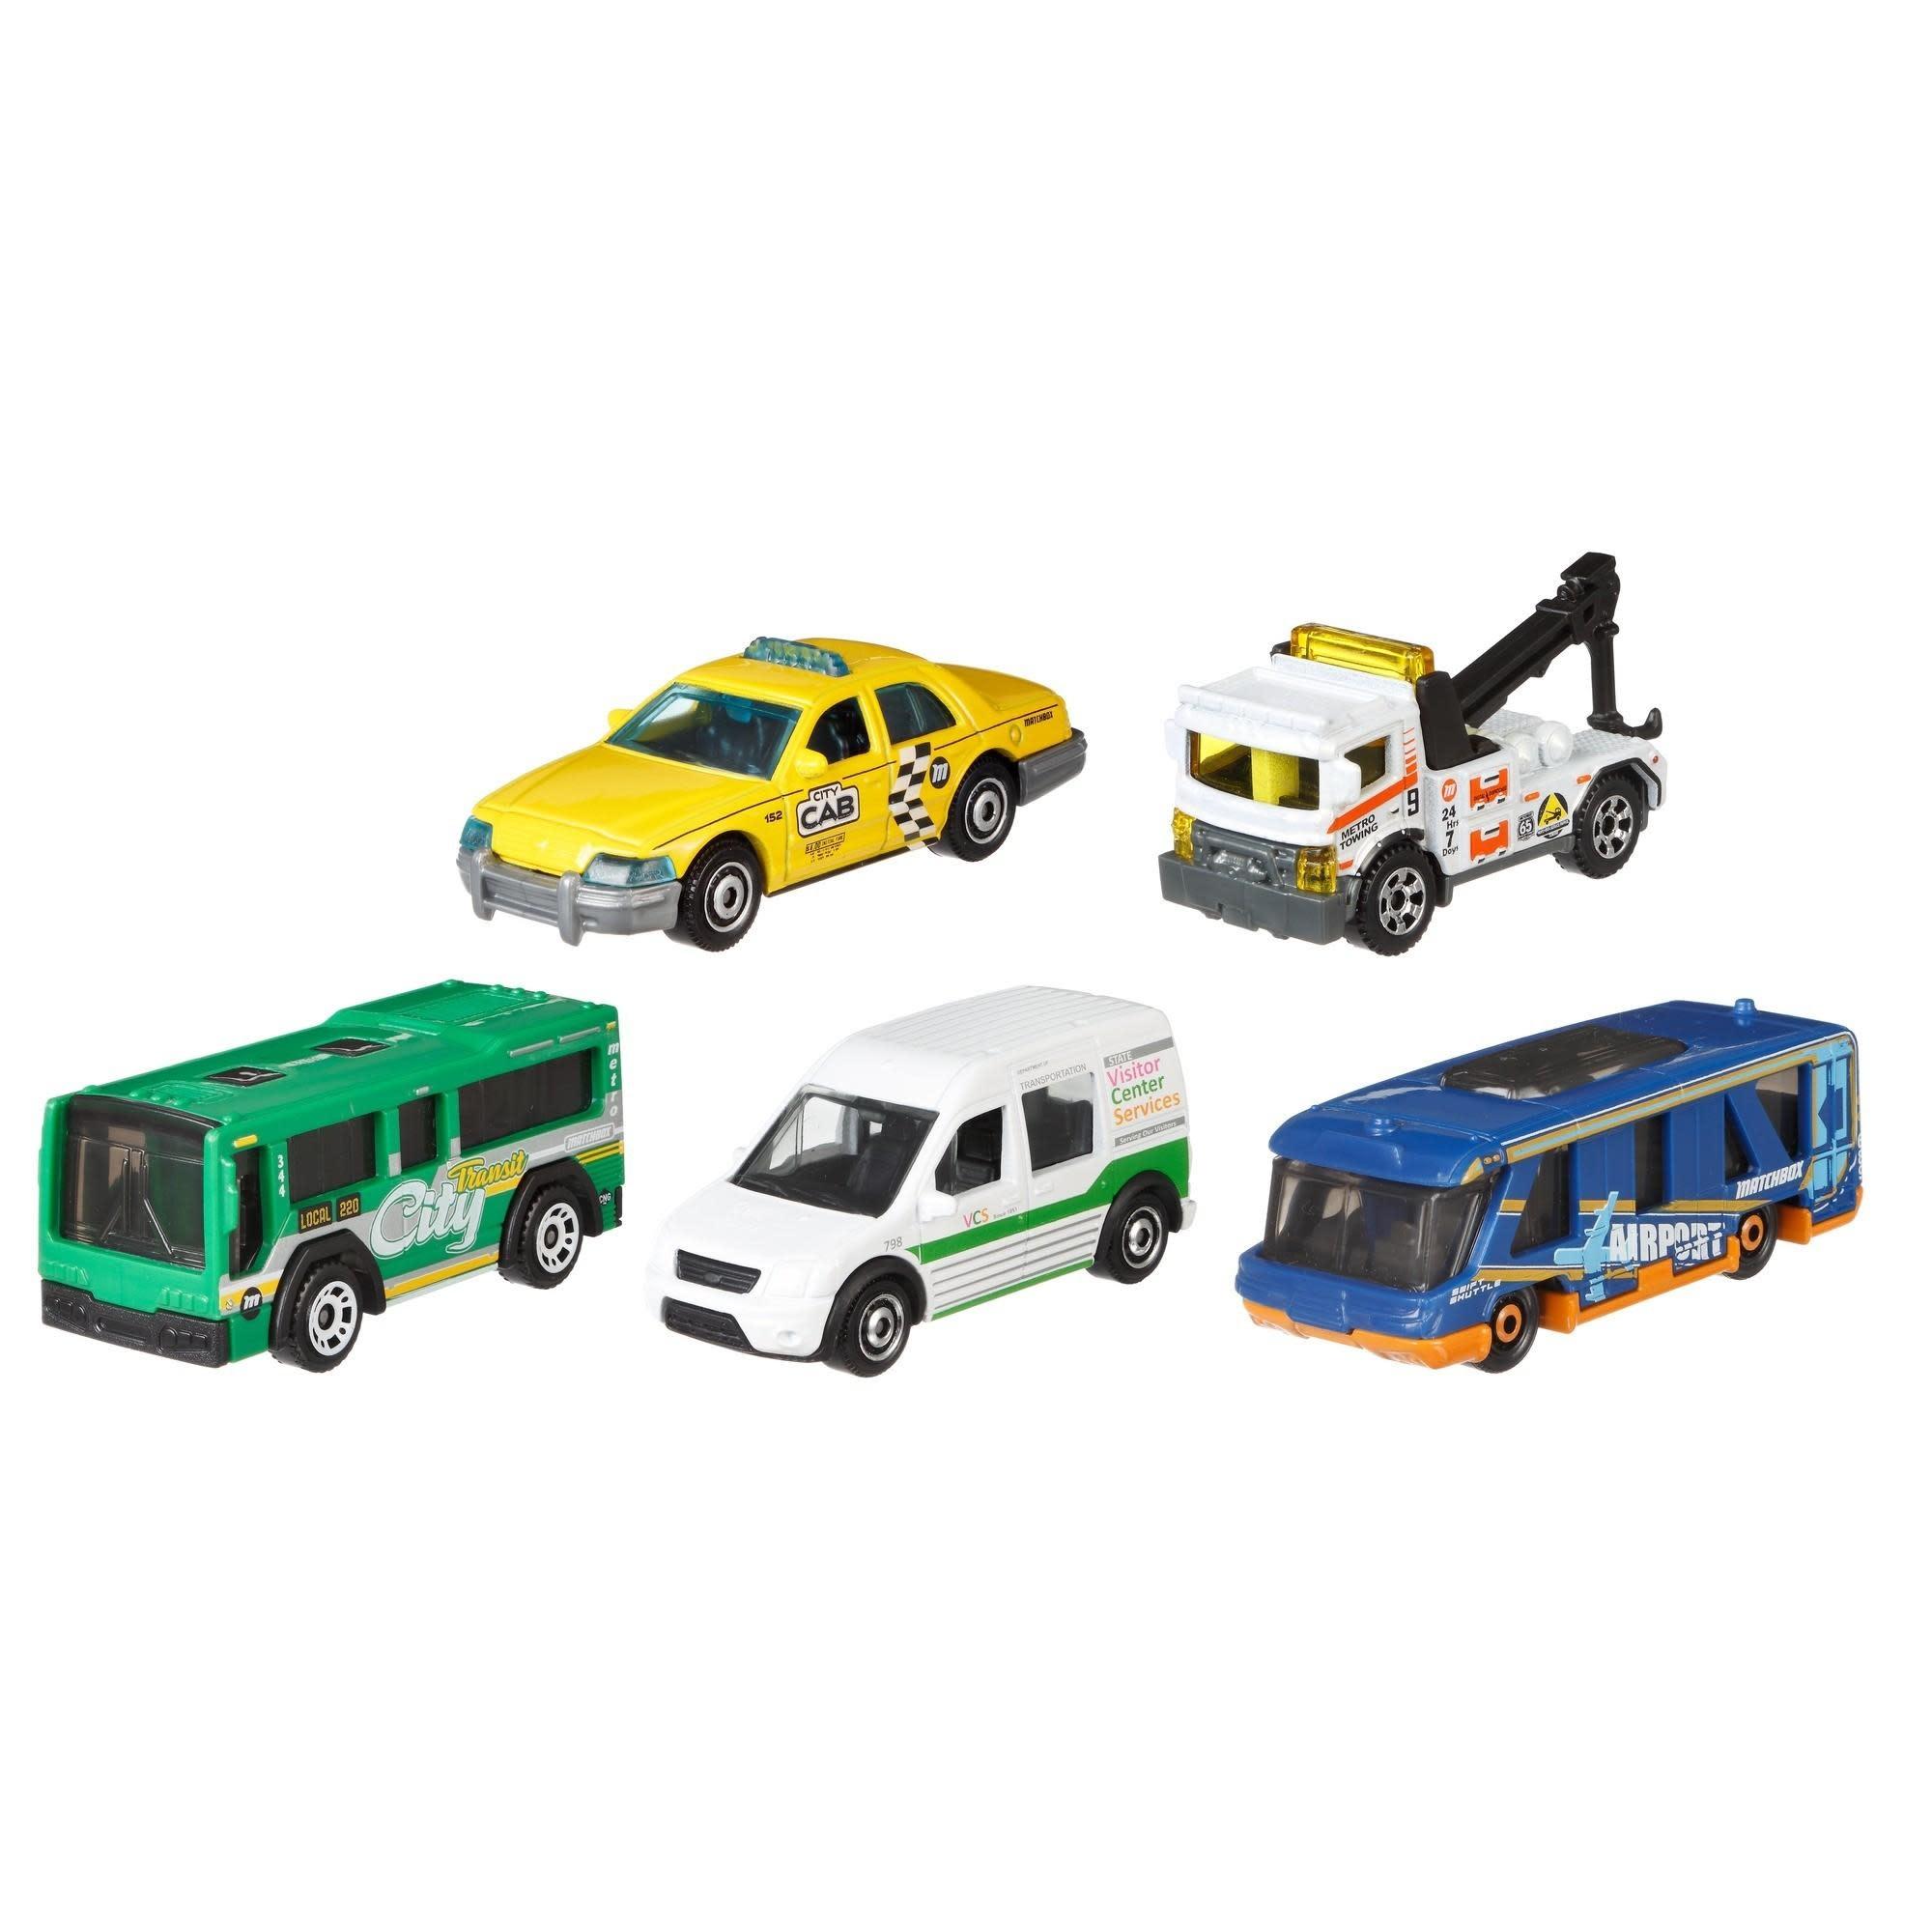 Matchbox Vehicle 5-pack Set by Mattel